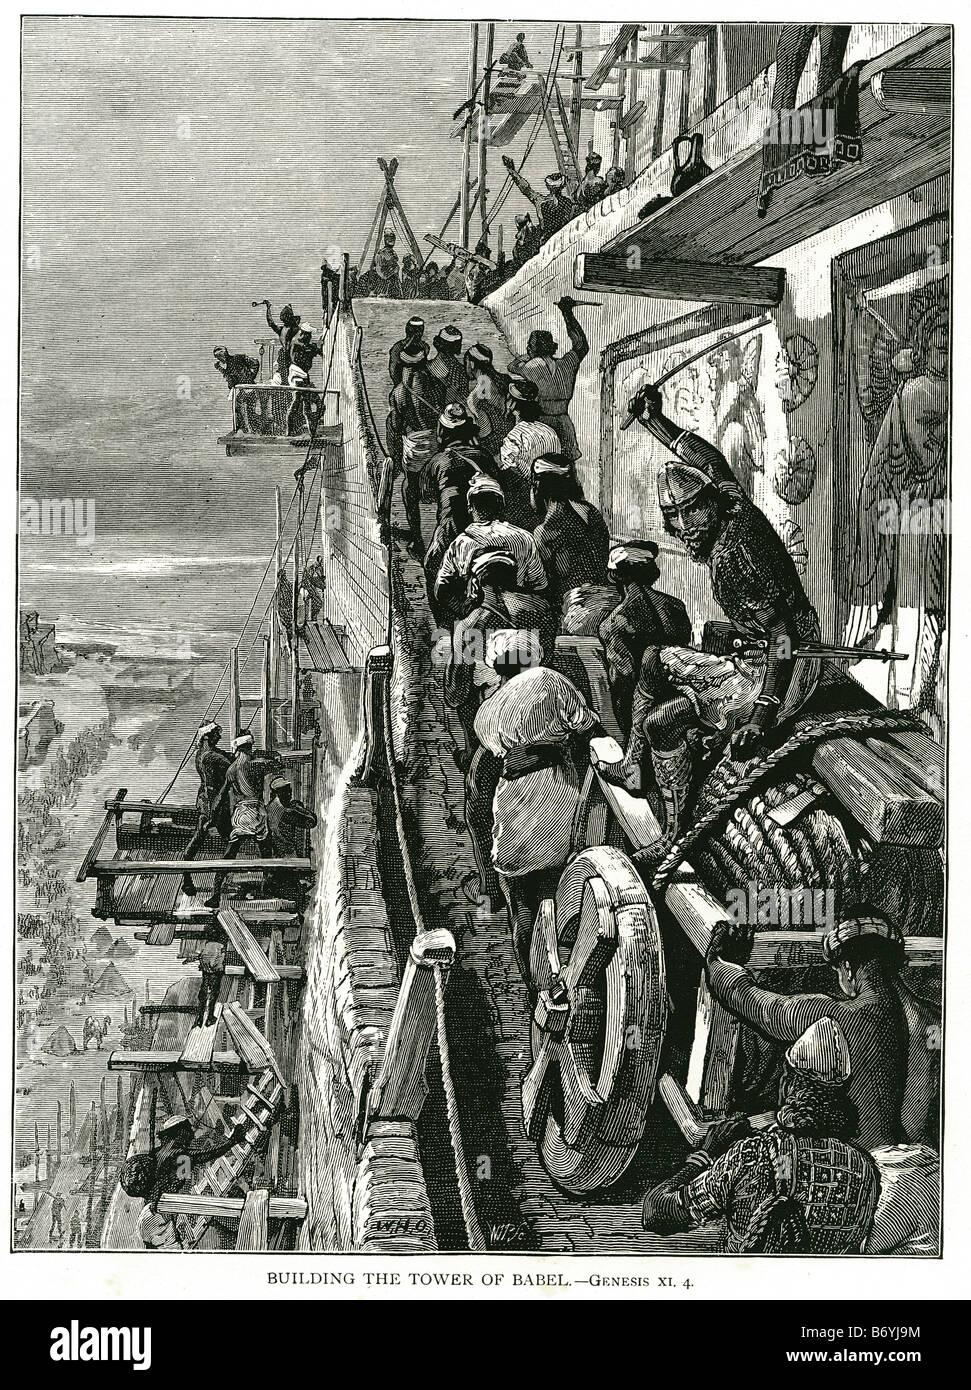 building the Tower of Babel Hebrew: מגדל בבל Migdal Bavel Arabic: برج بابل Burj Babil chapter 11 Genesis was an - Stock Image